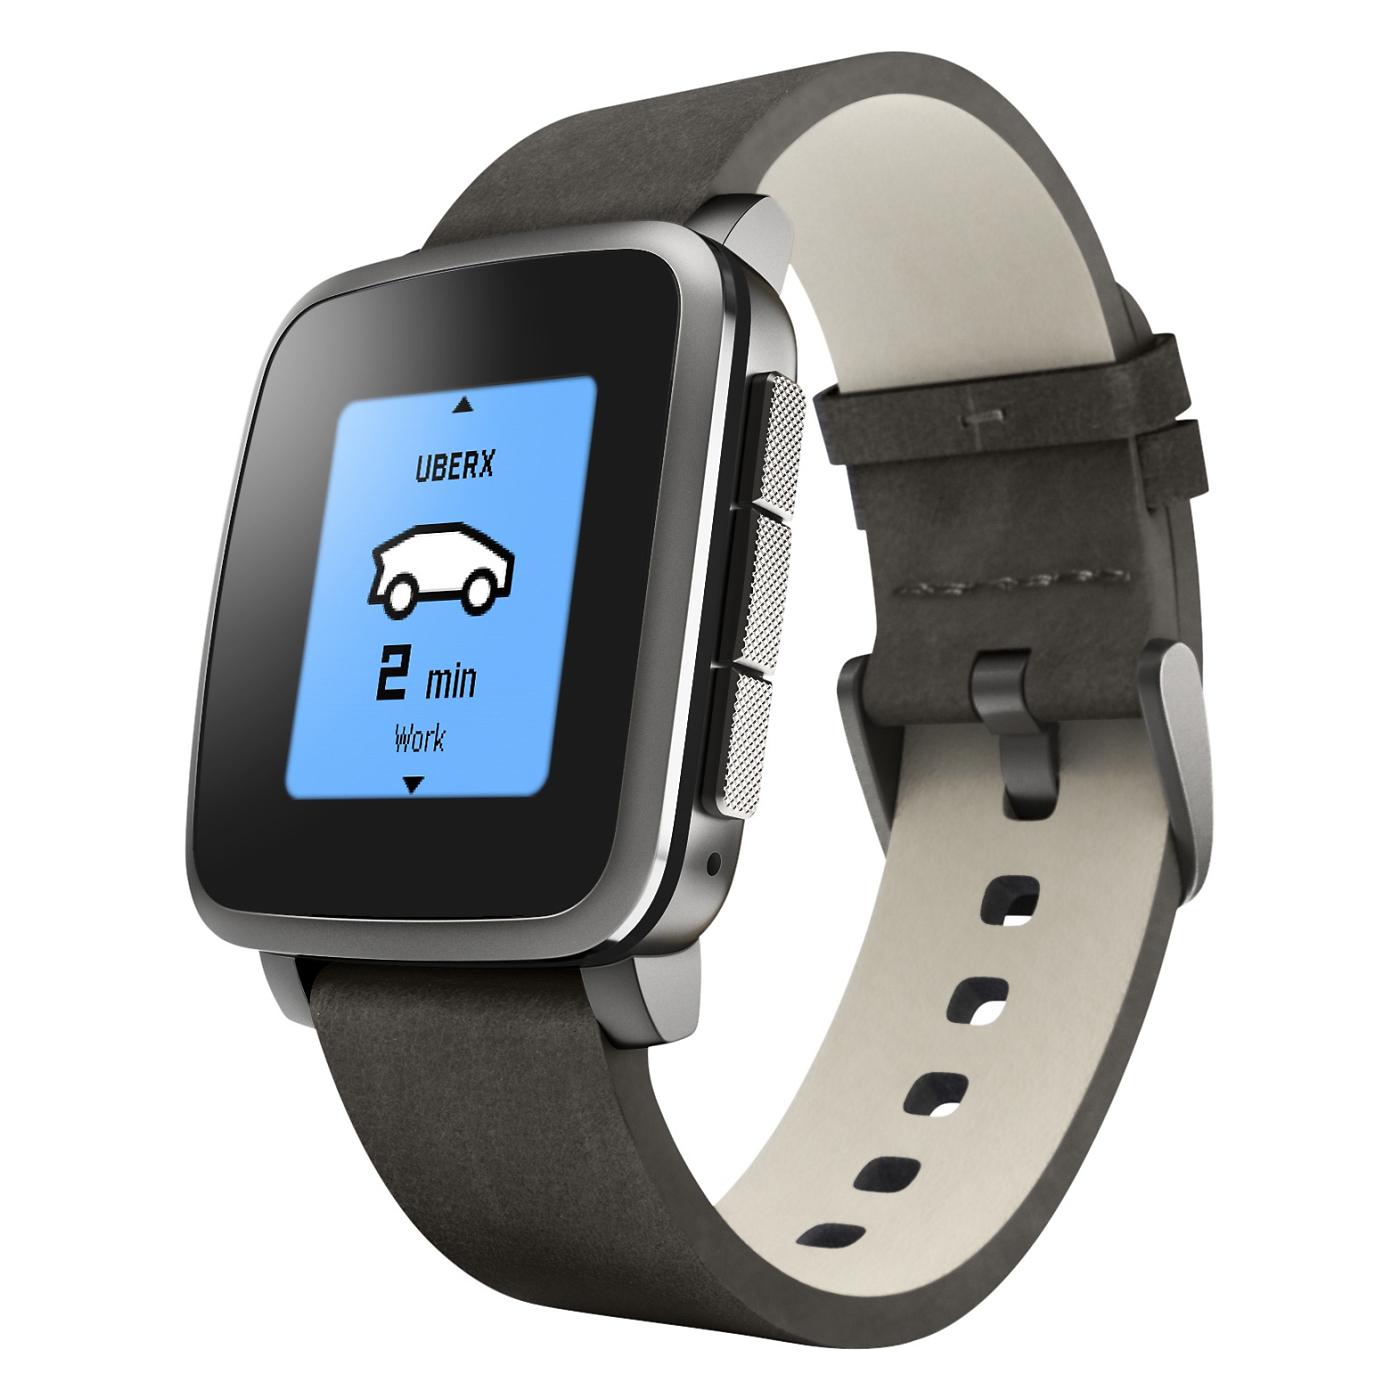 Pebble Time Steel Smartwatch Black